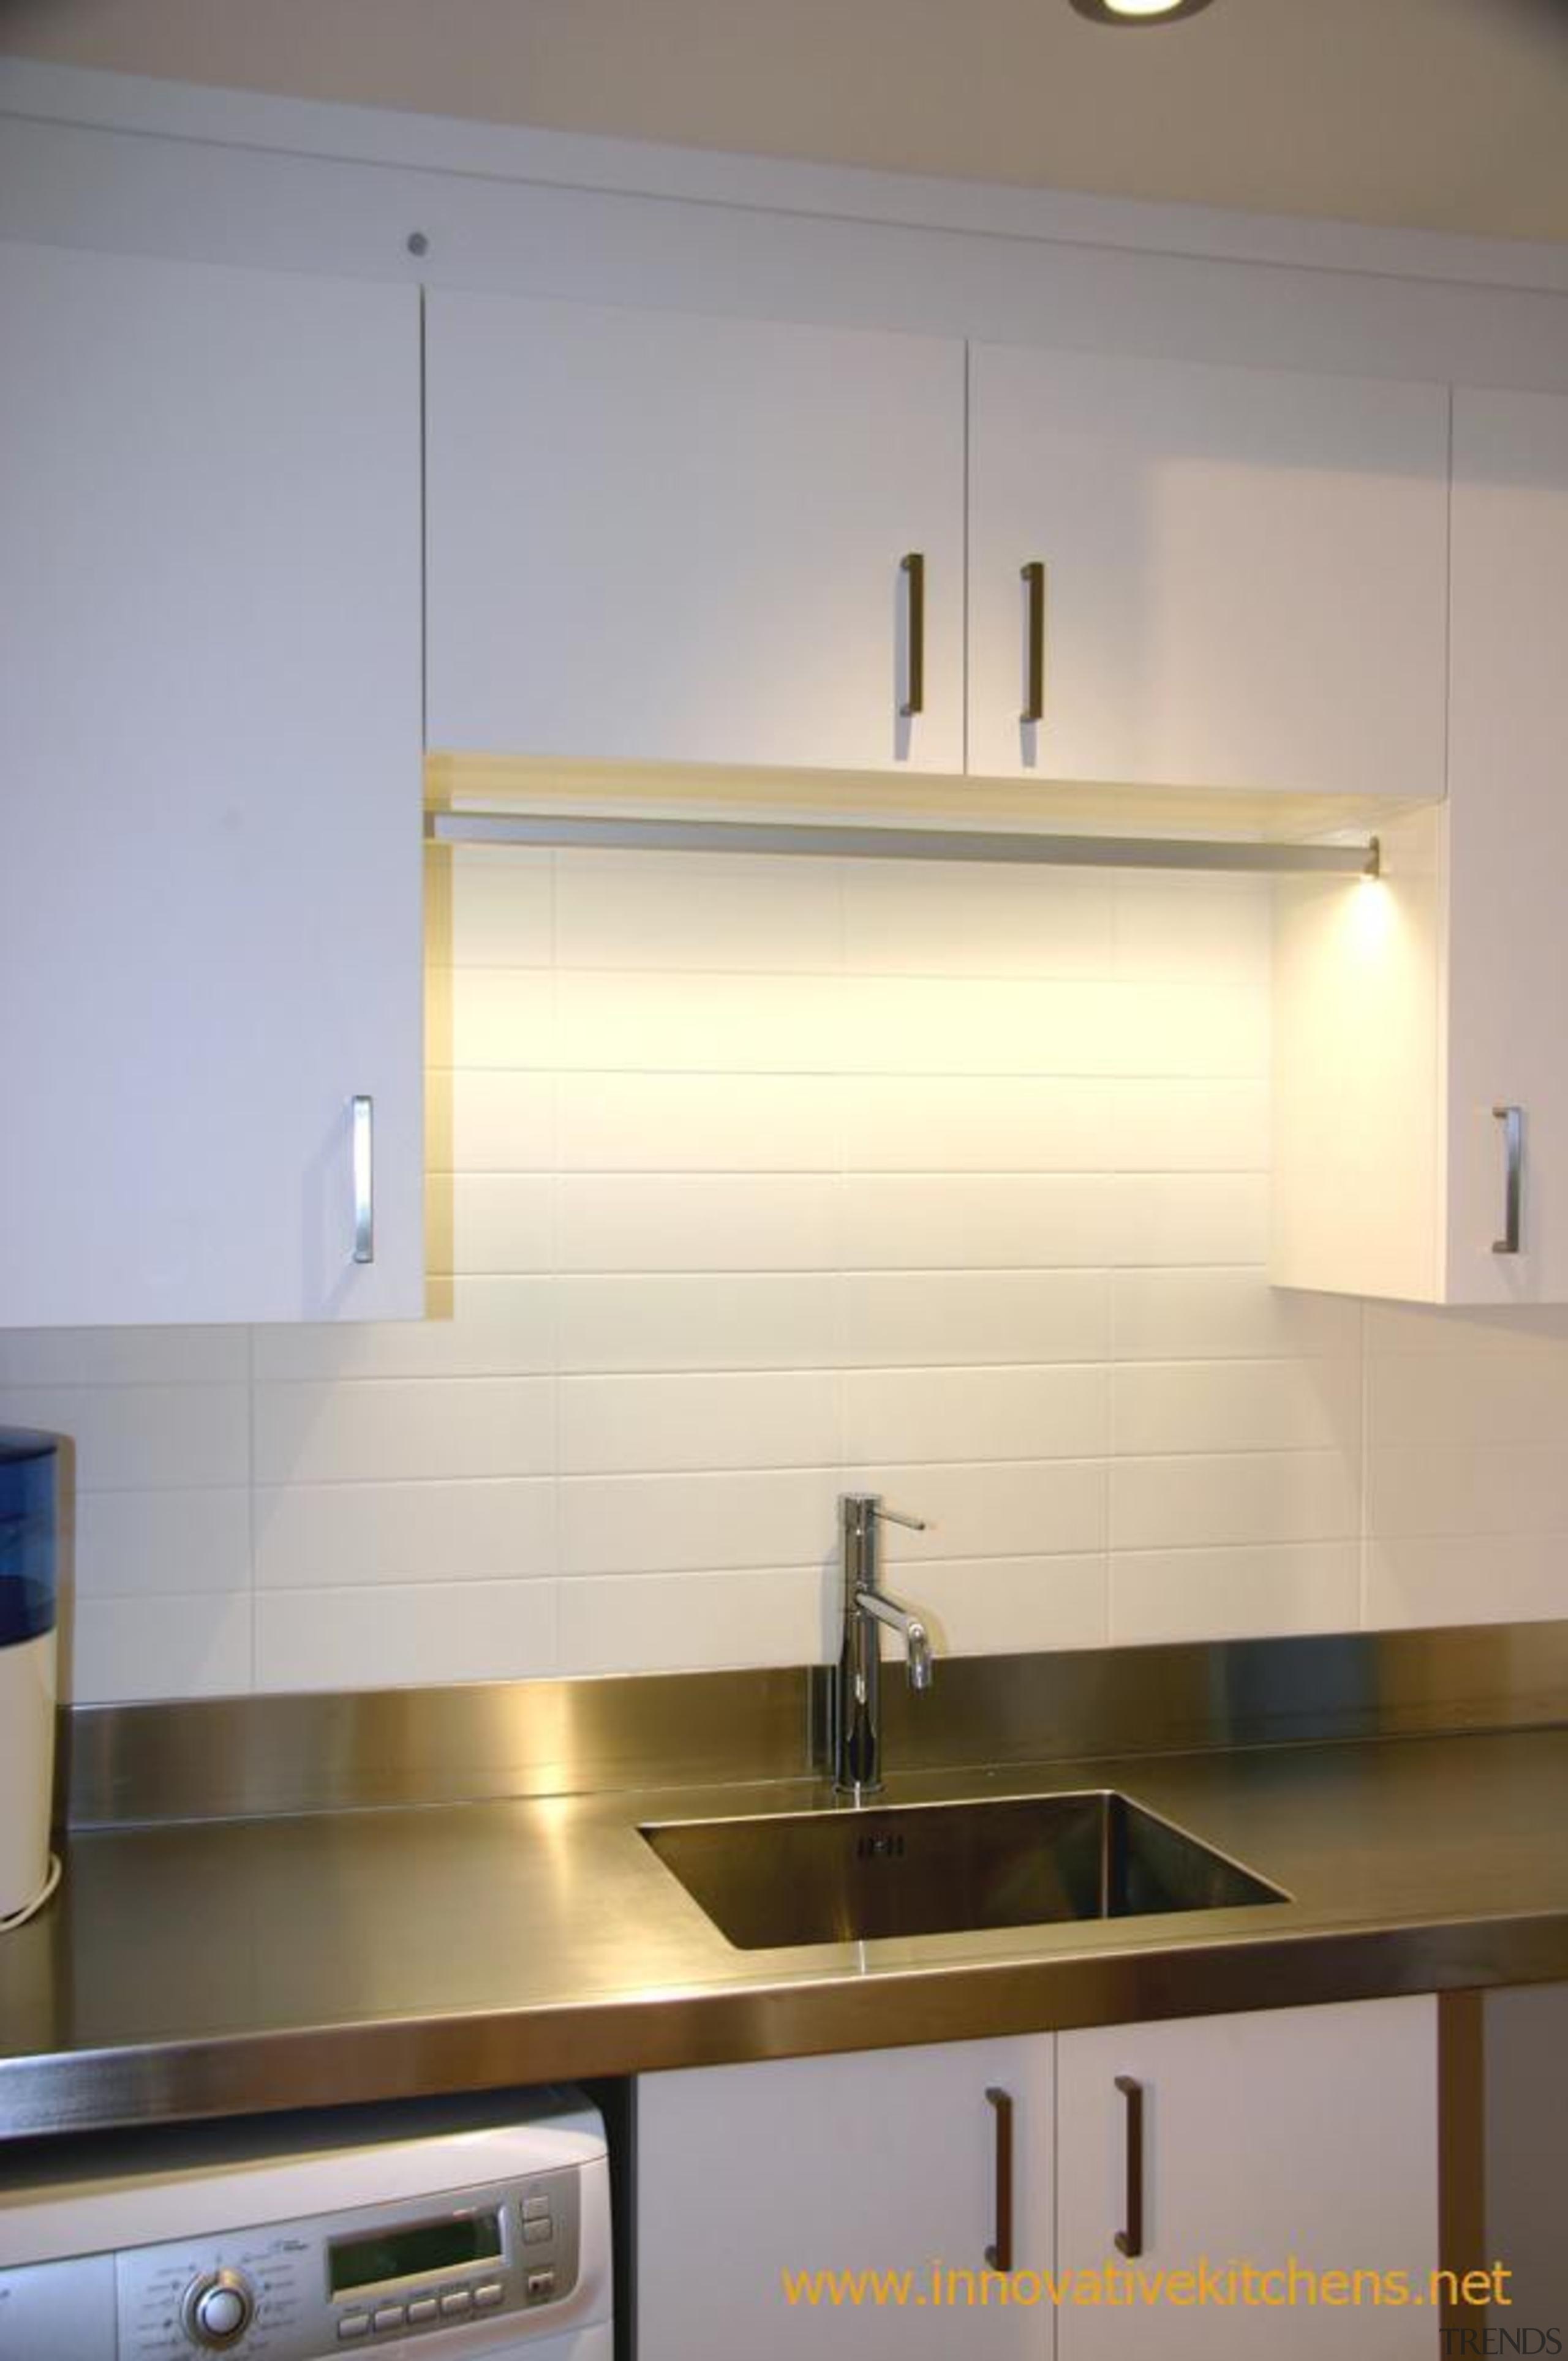 Laundry, LED inside clothing rail. - modern_glendowie_2013_8.jpg - cabinetry, countertop, interior design, kitchen, light fixture, lighting, room, sink, under cabinet lighting, gray